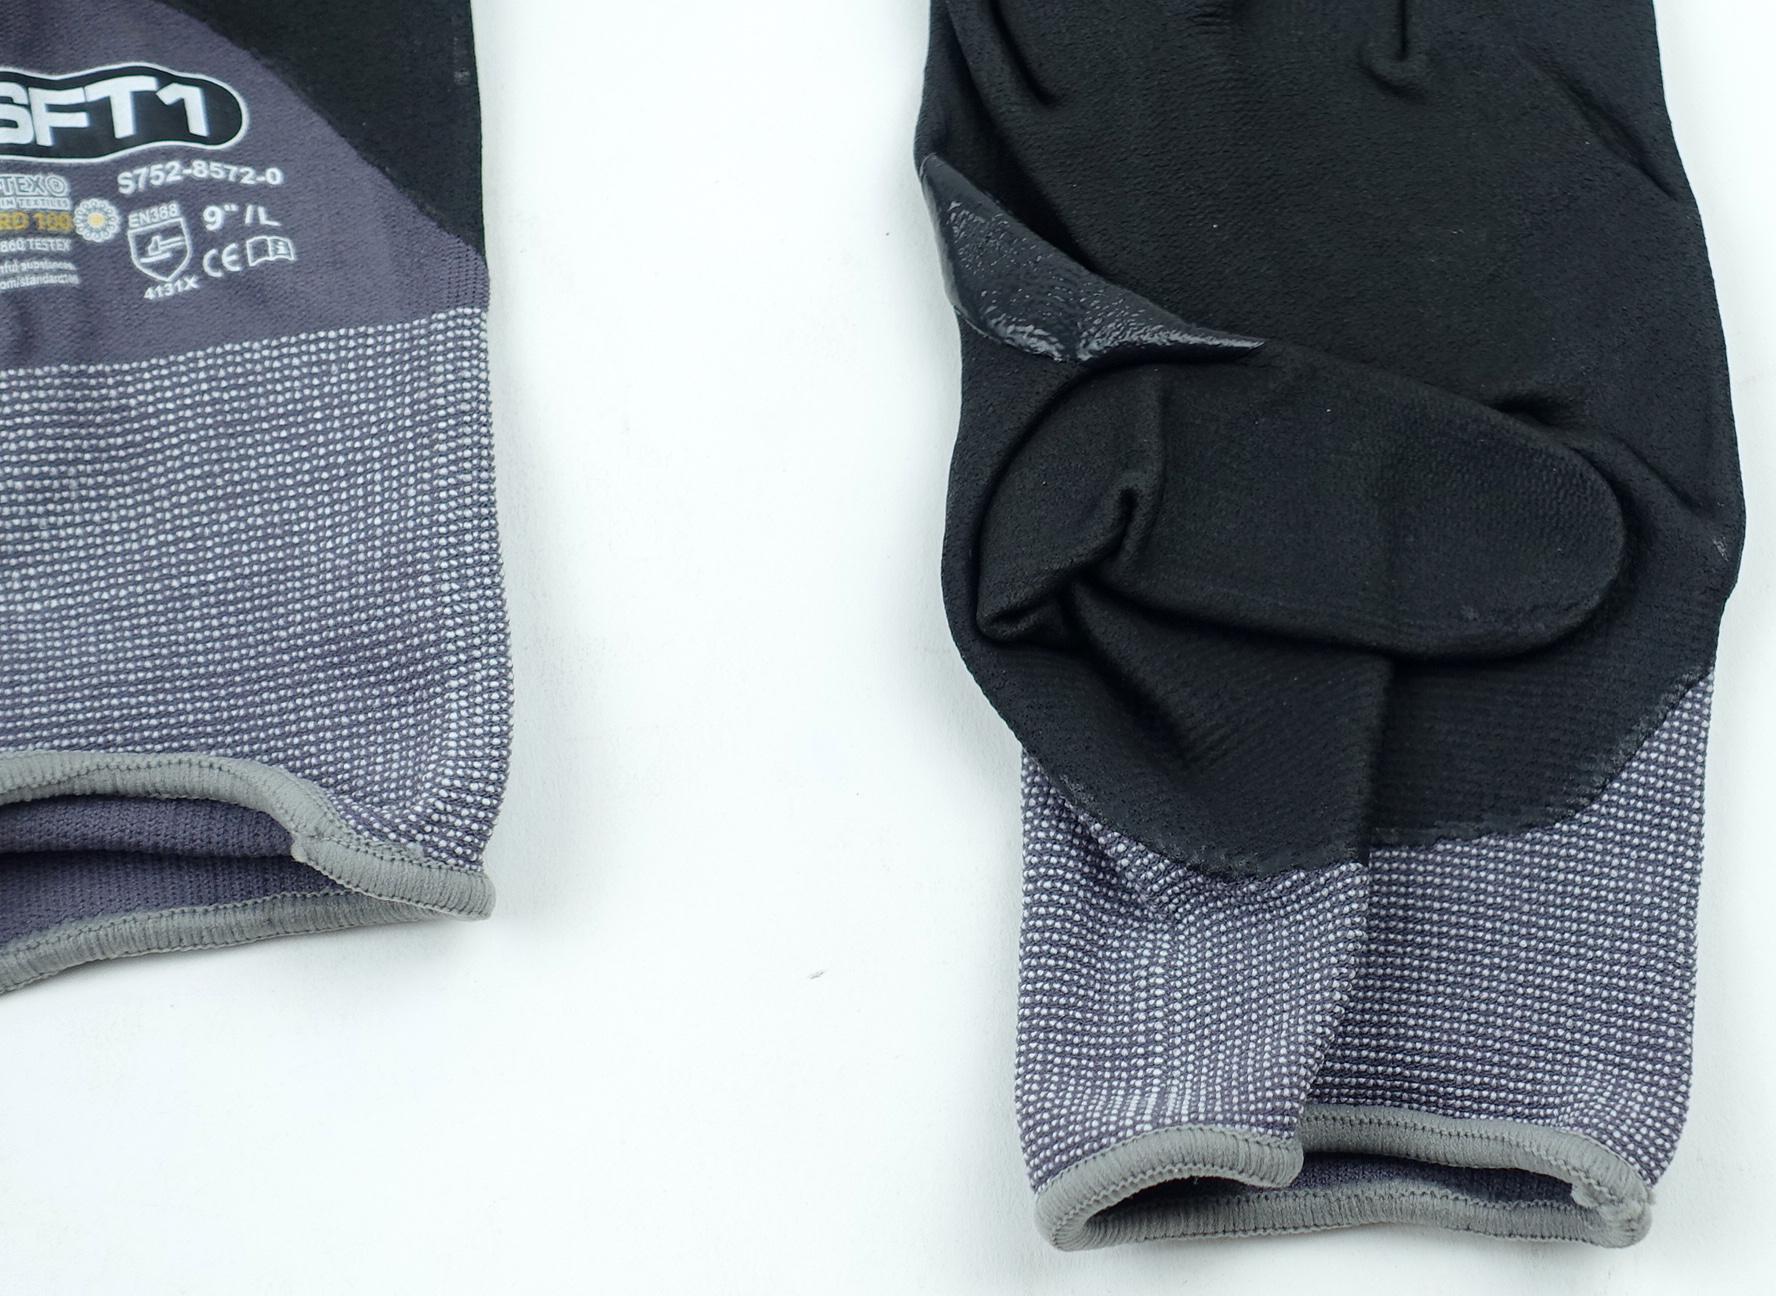 "Oeko-Tex S752-8572-0-9L SFT1 Standard 100 9"" Large Glove Gray/Black 1 Pair - image 7"